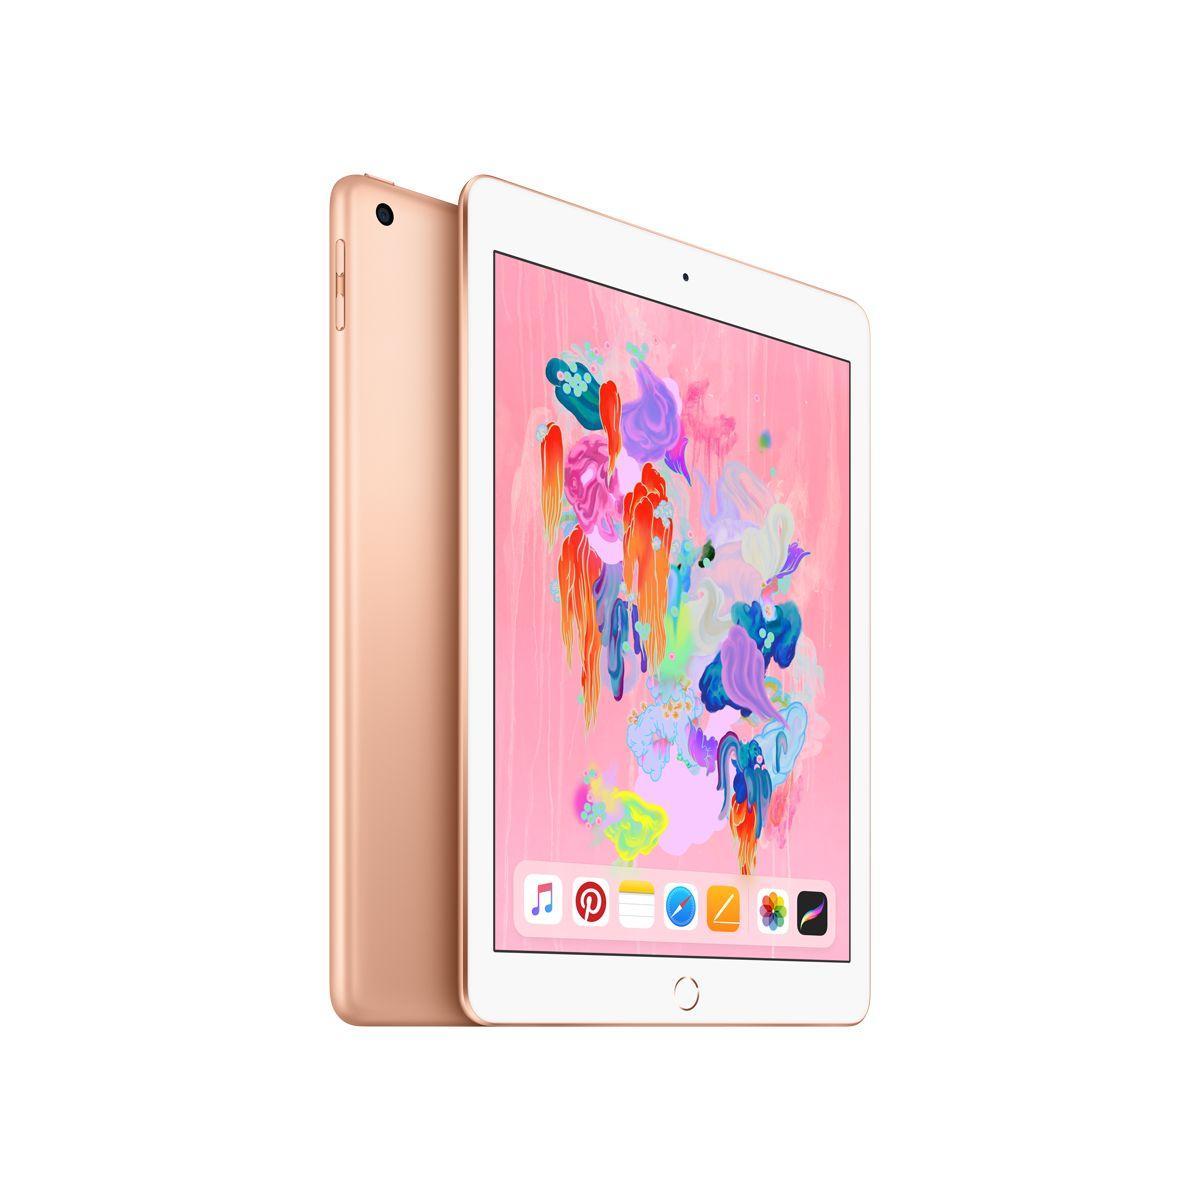 Tablette apple ipad new 128go or (photo)